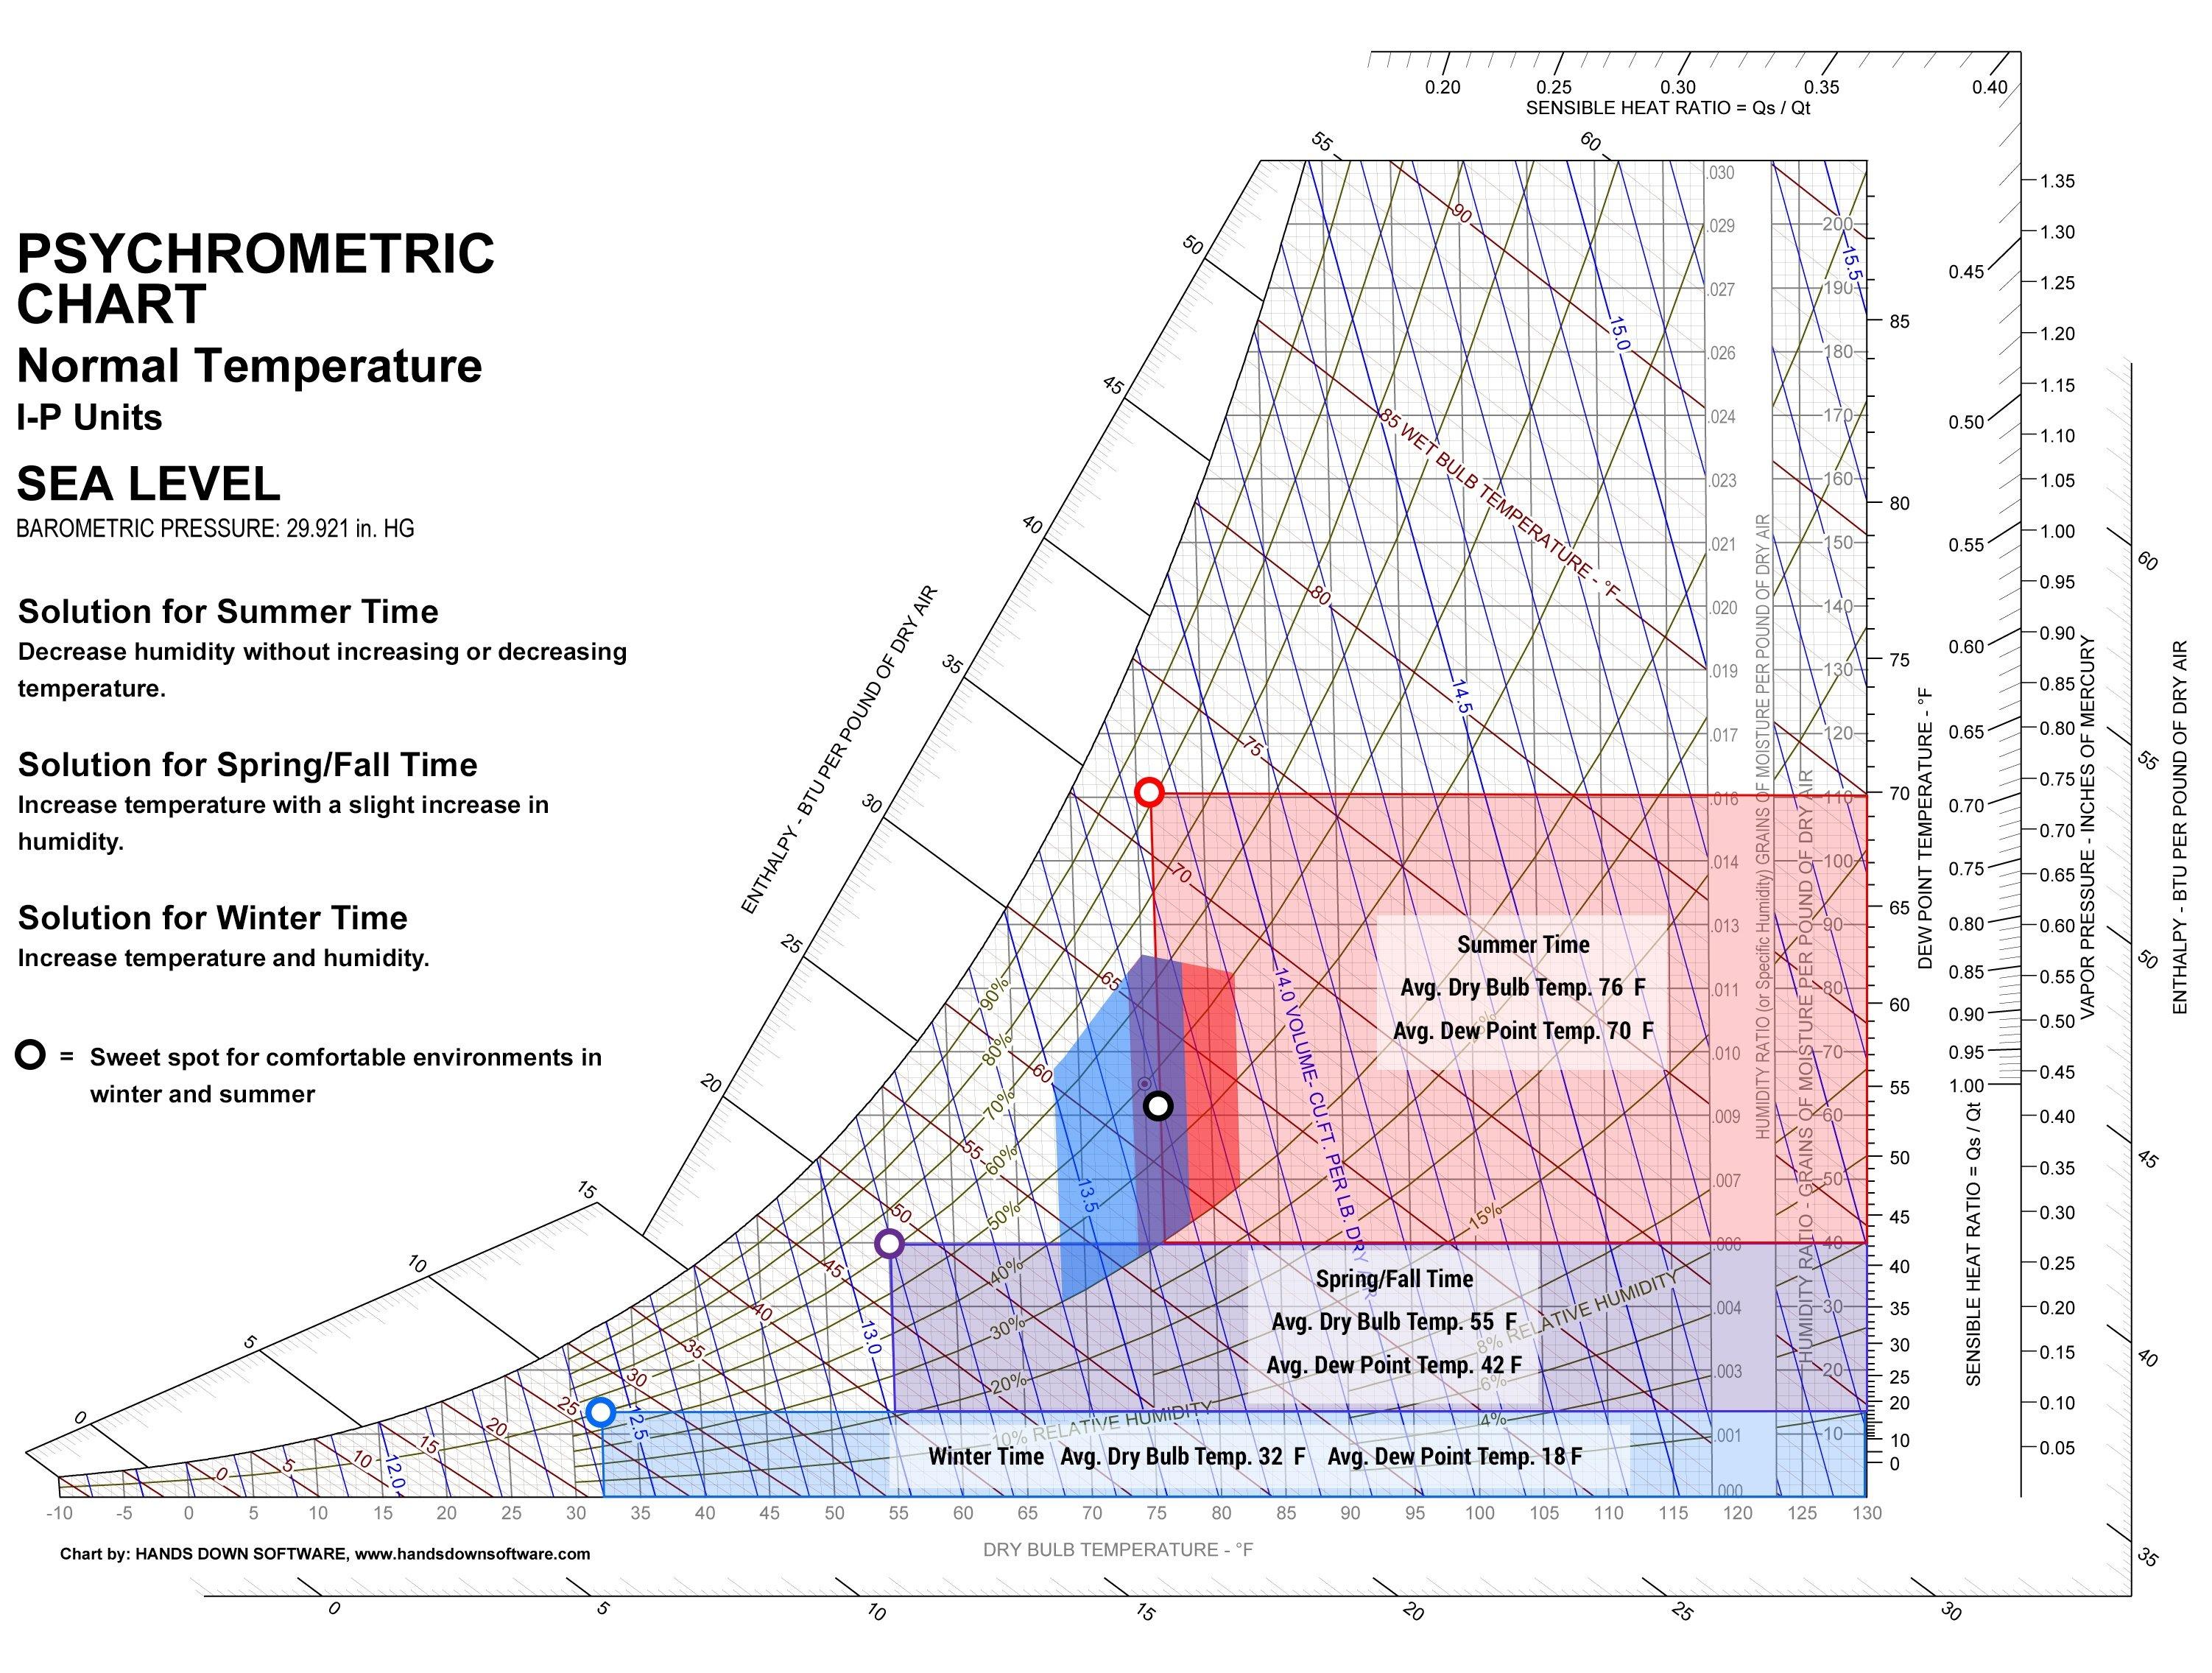 Phychrometric Chart for New York